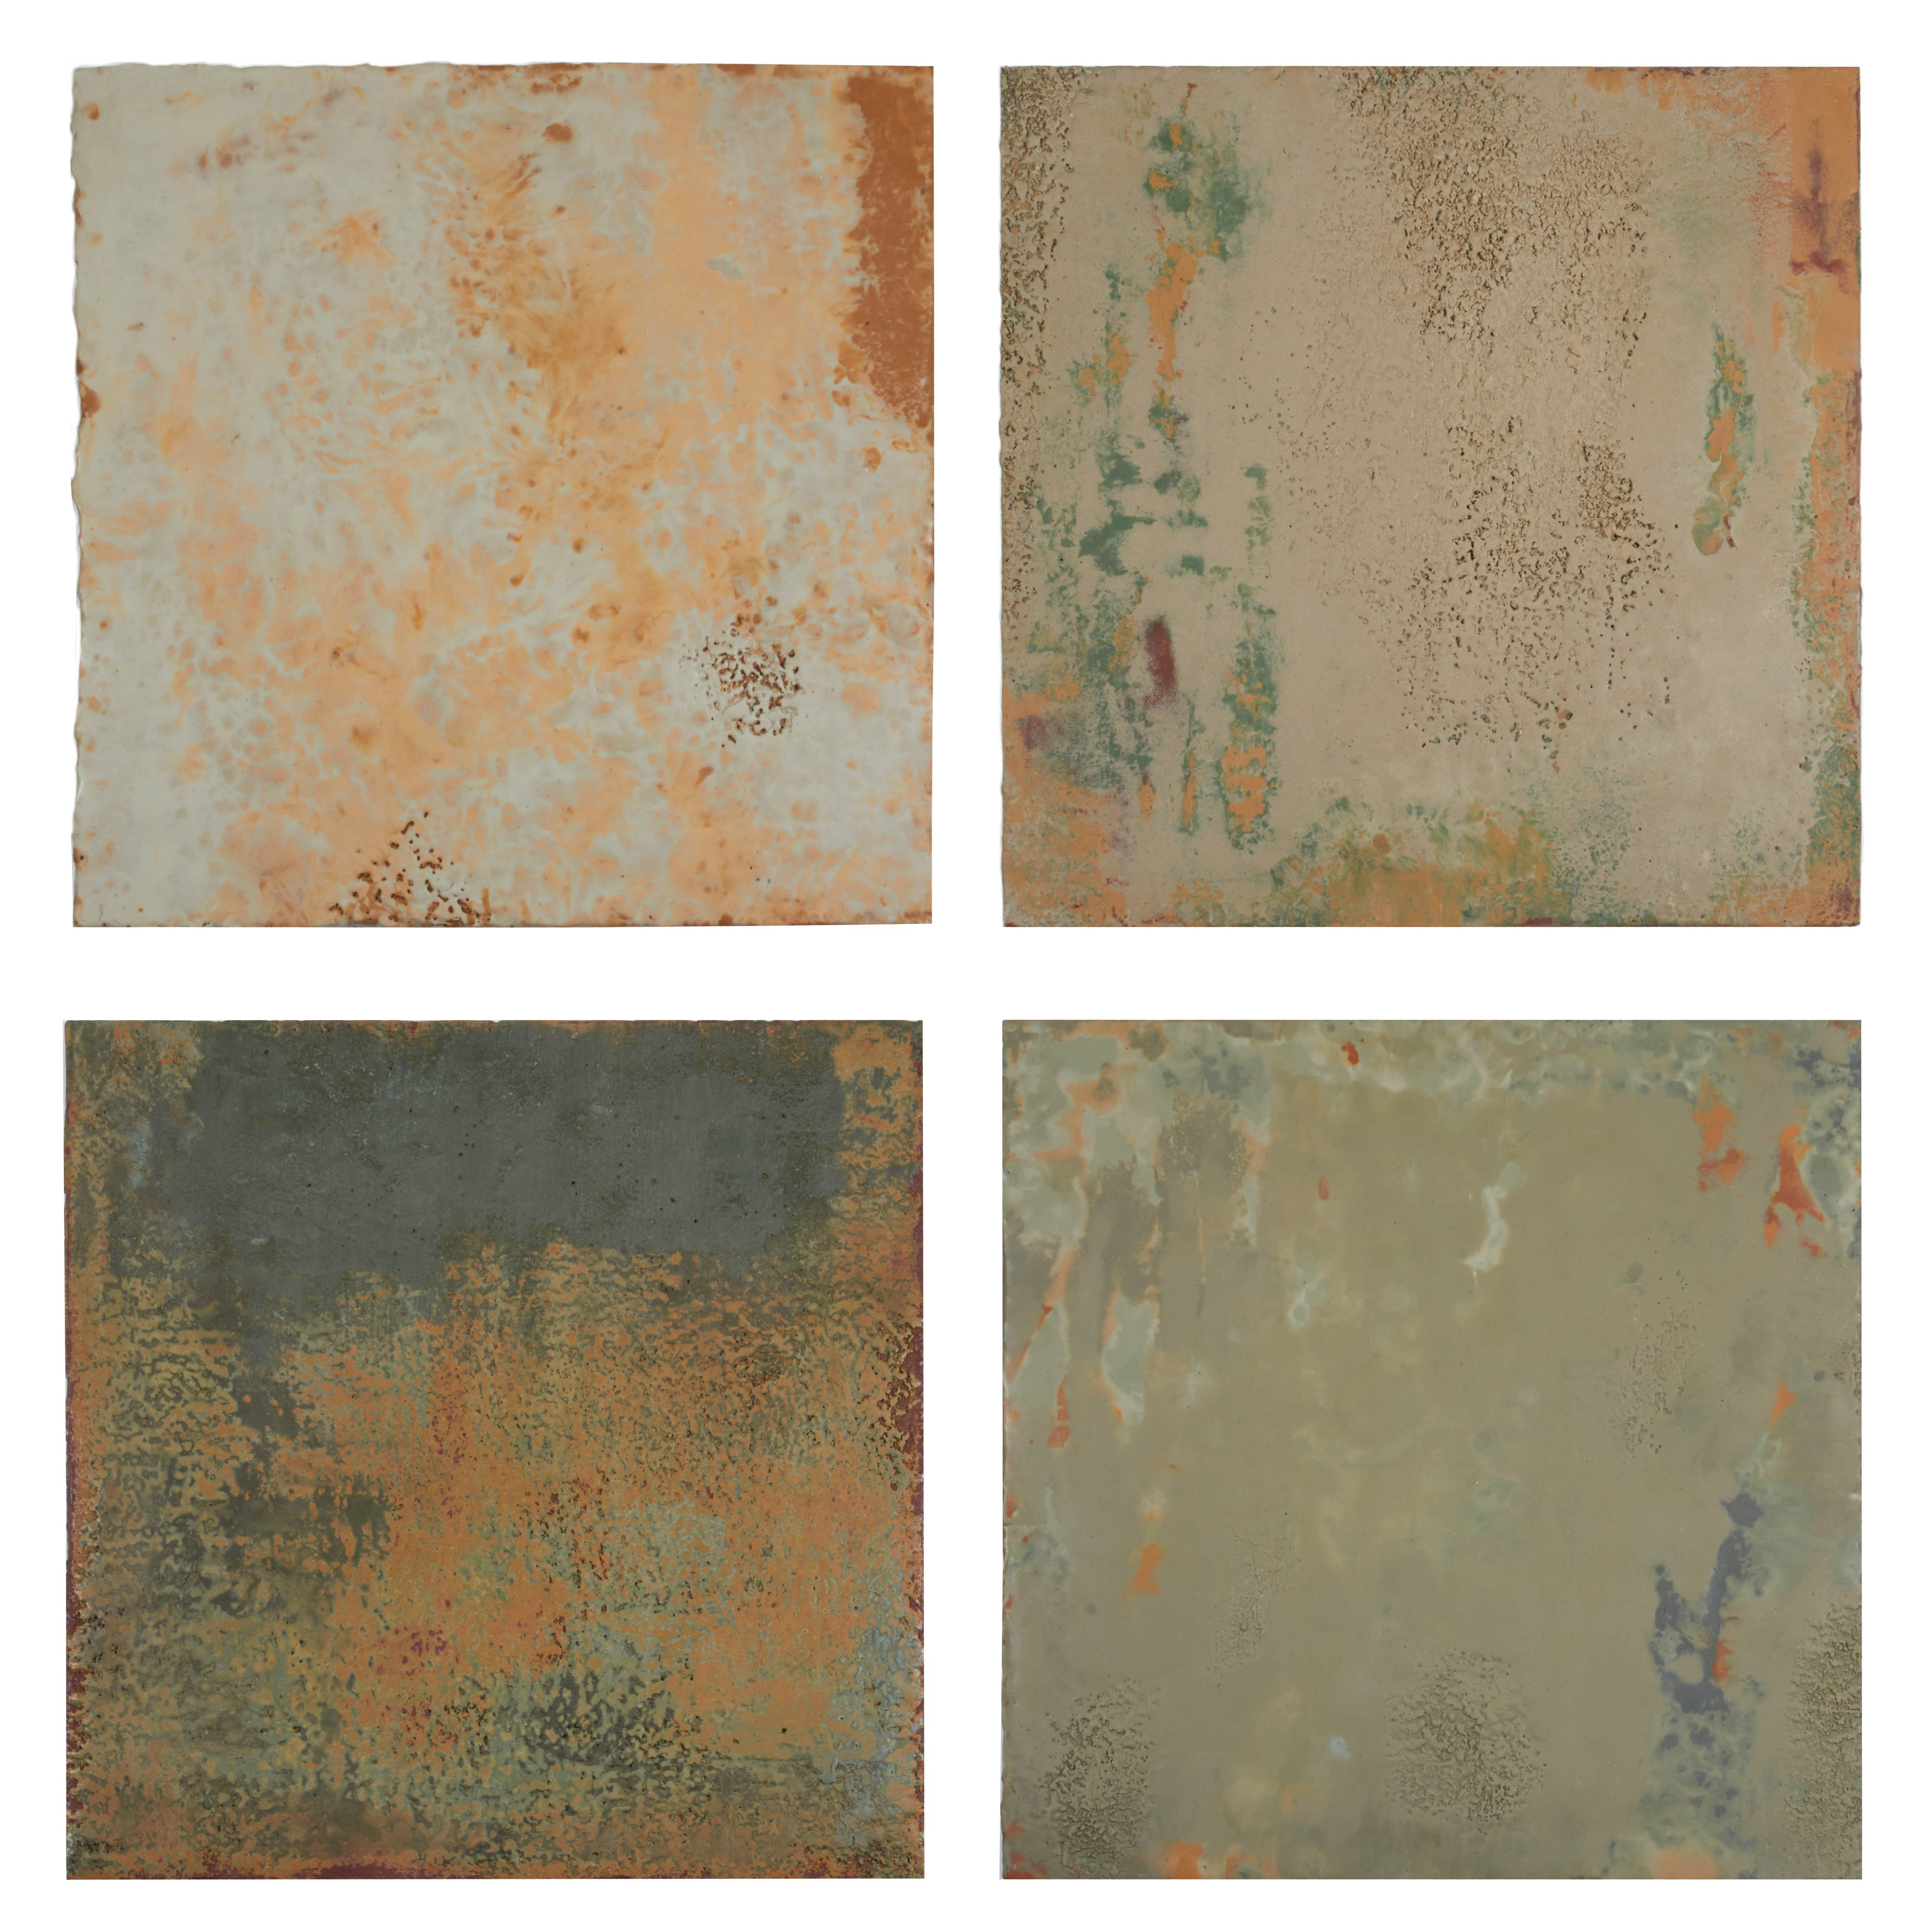 Richard Hirsch Encaustic Painting of Nothing Series, circa 2010 - 2012